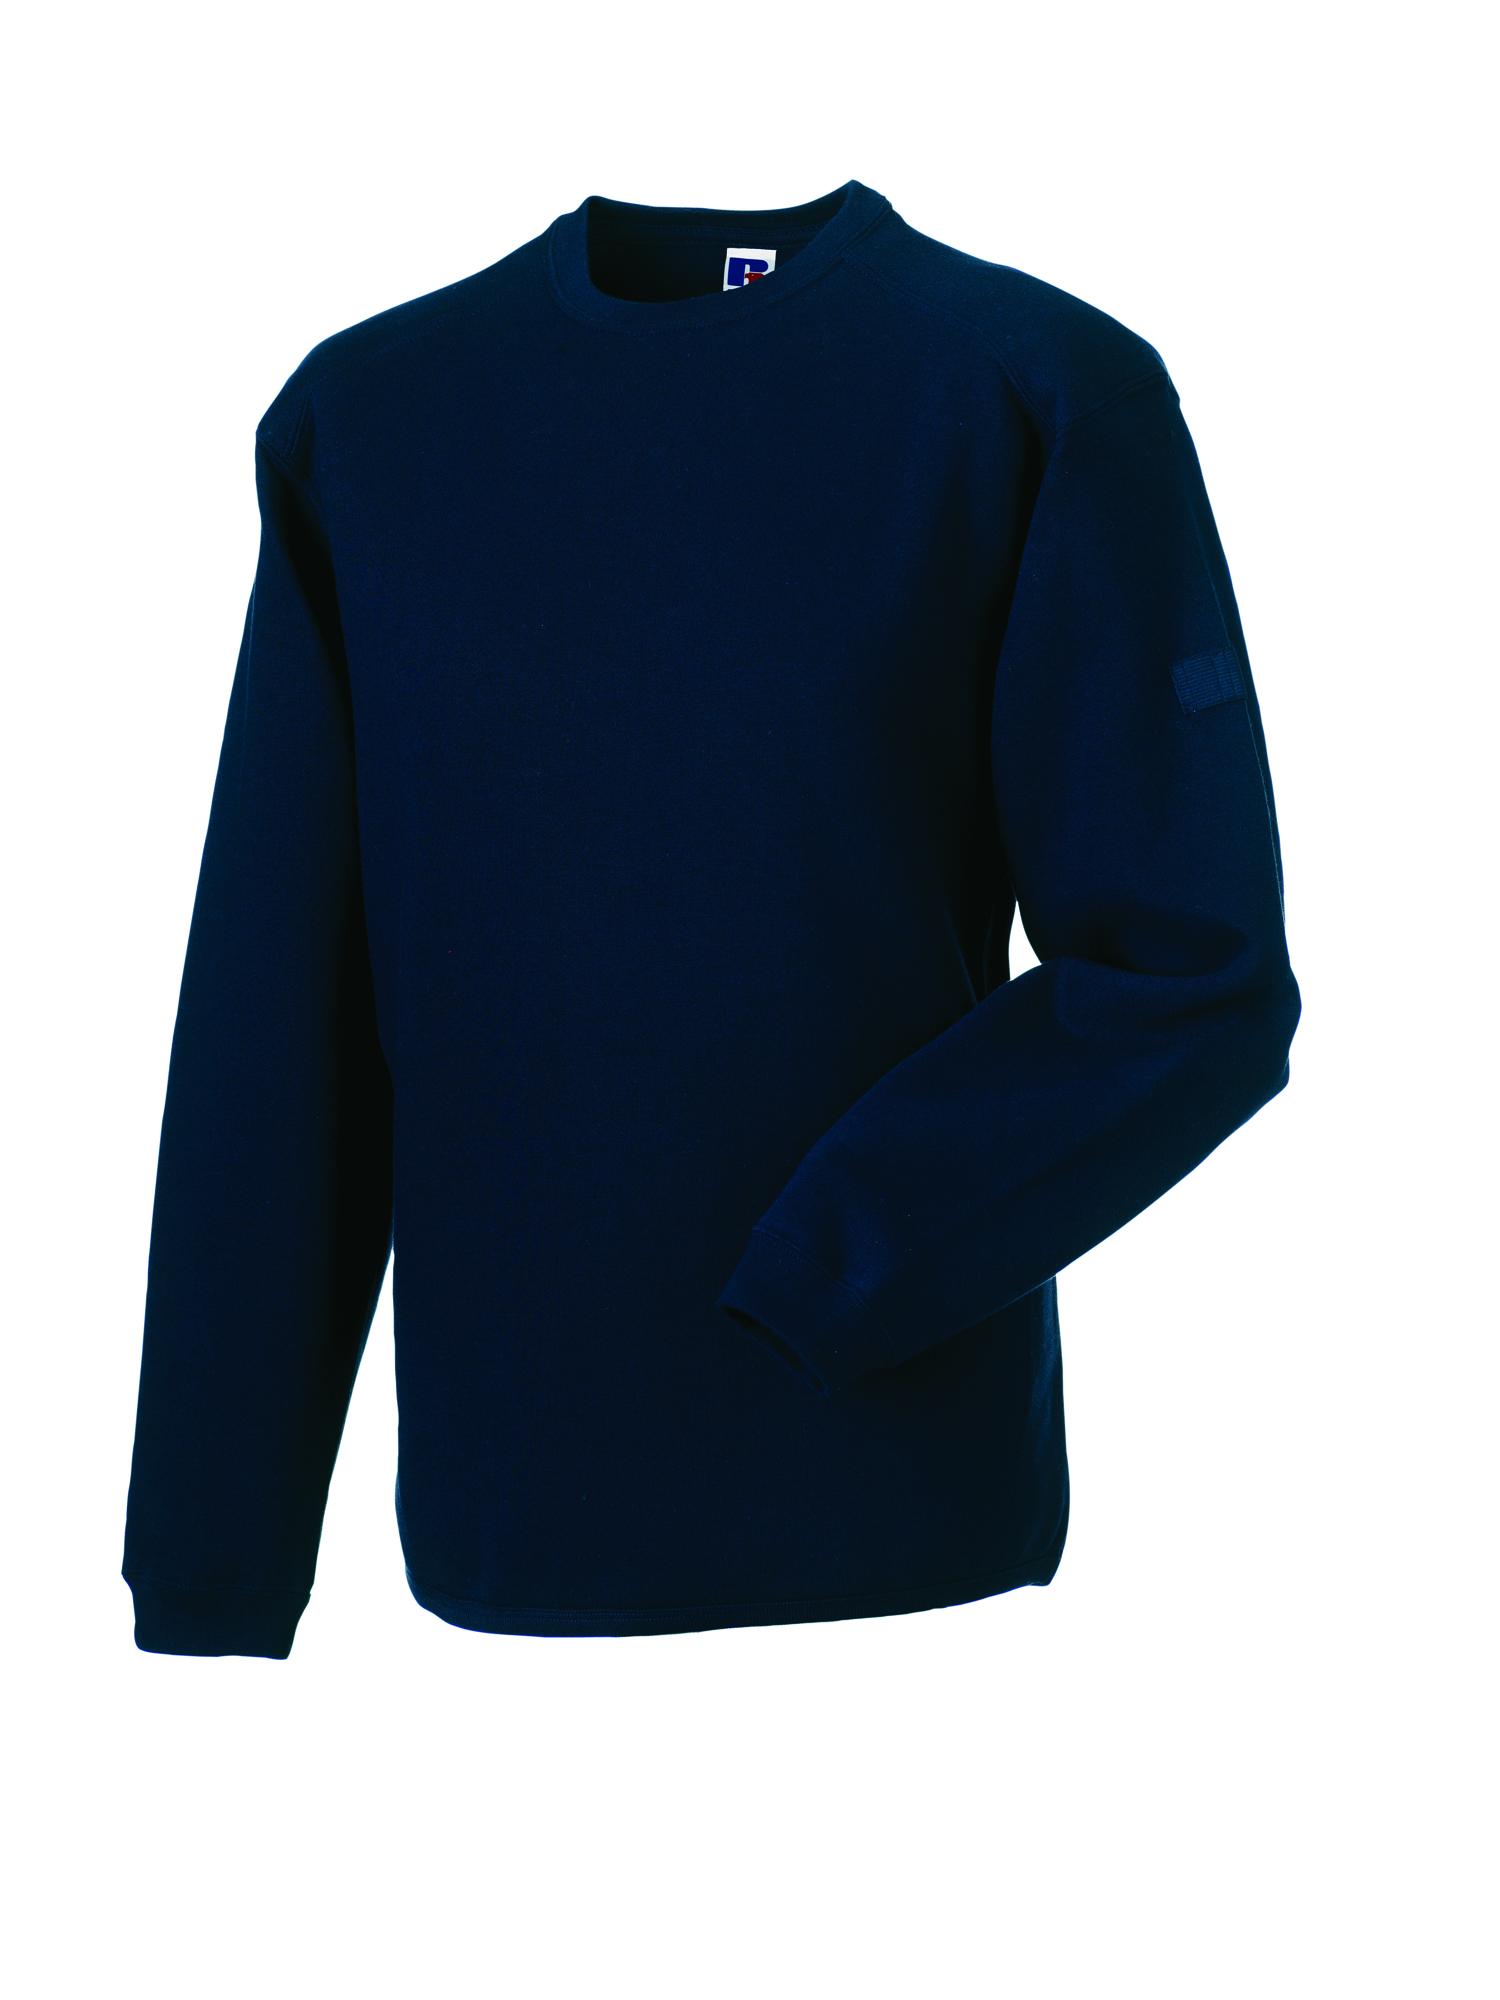 Heavy Duty Crewneck Sweatshirt - Light Oxford - XS